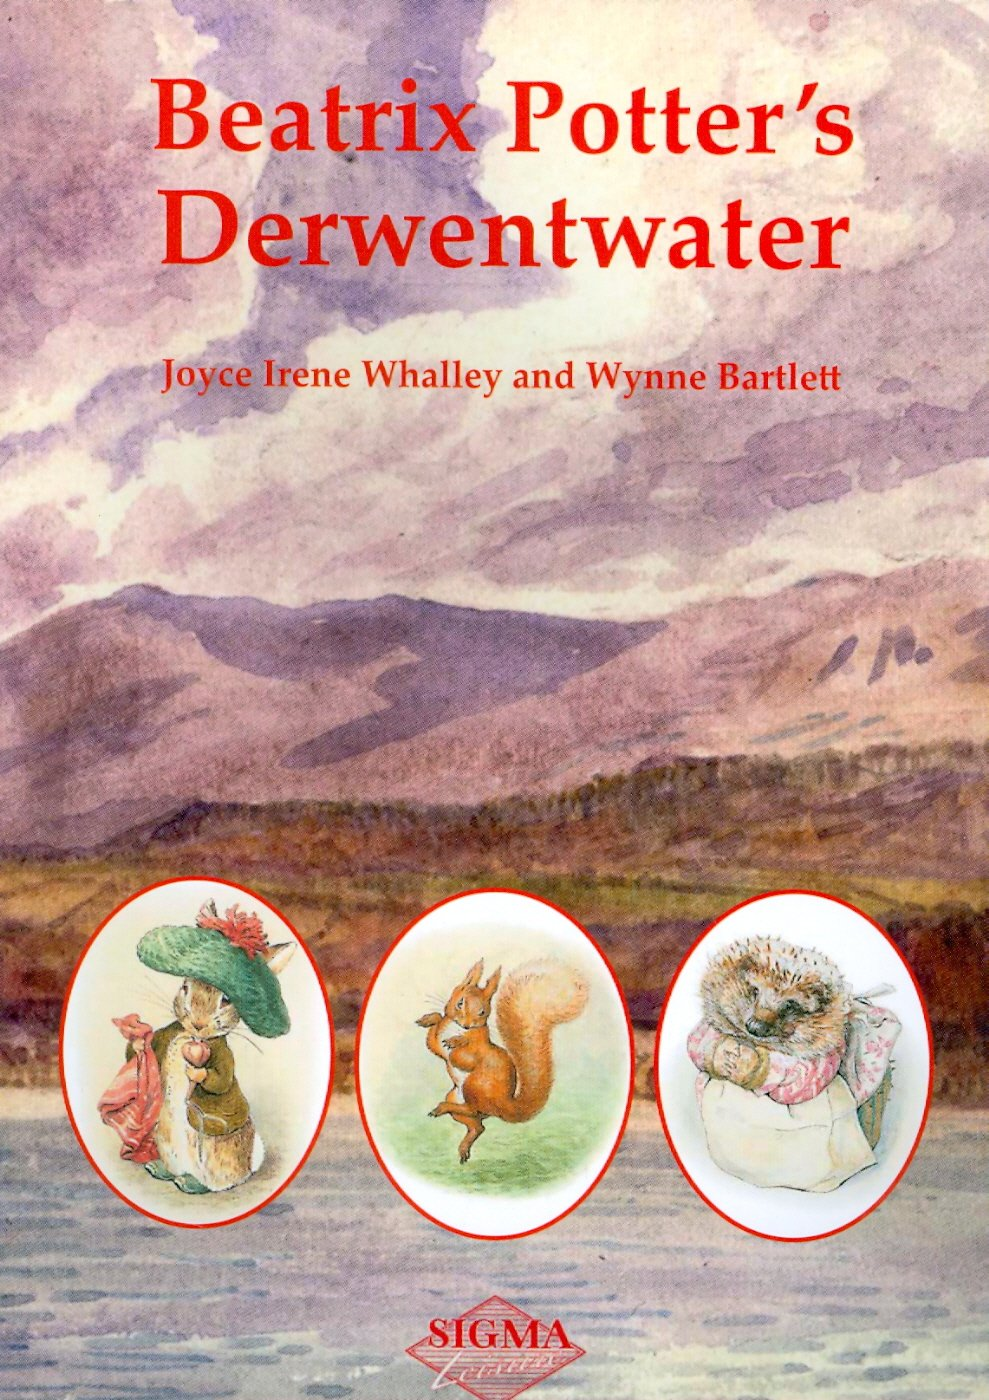 Beatrix Potter's Derwentwater [Idioma Inglés]